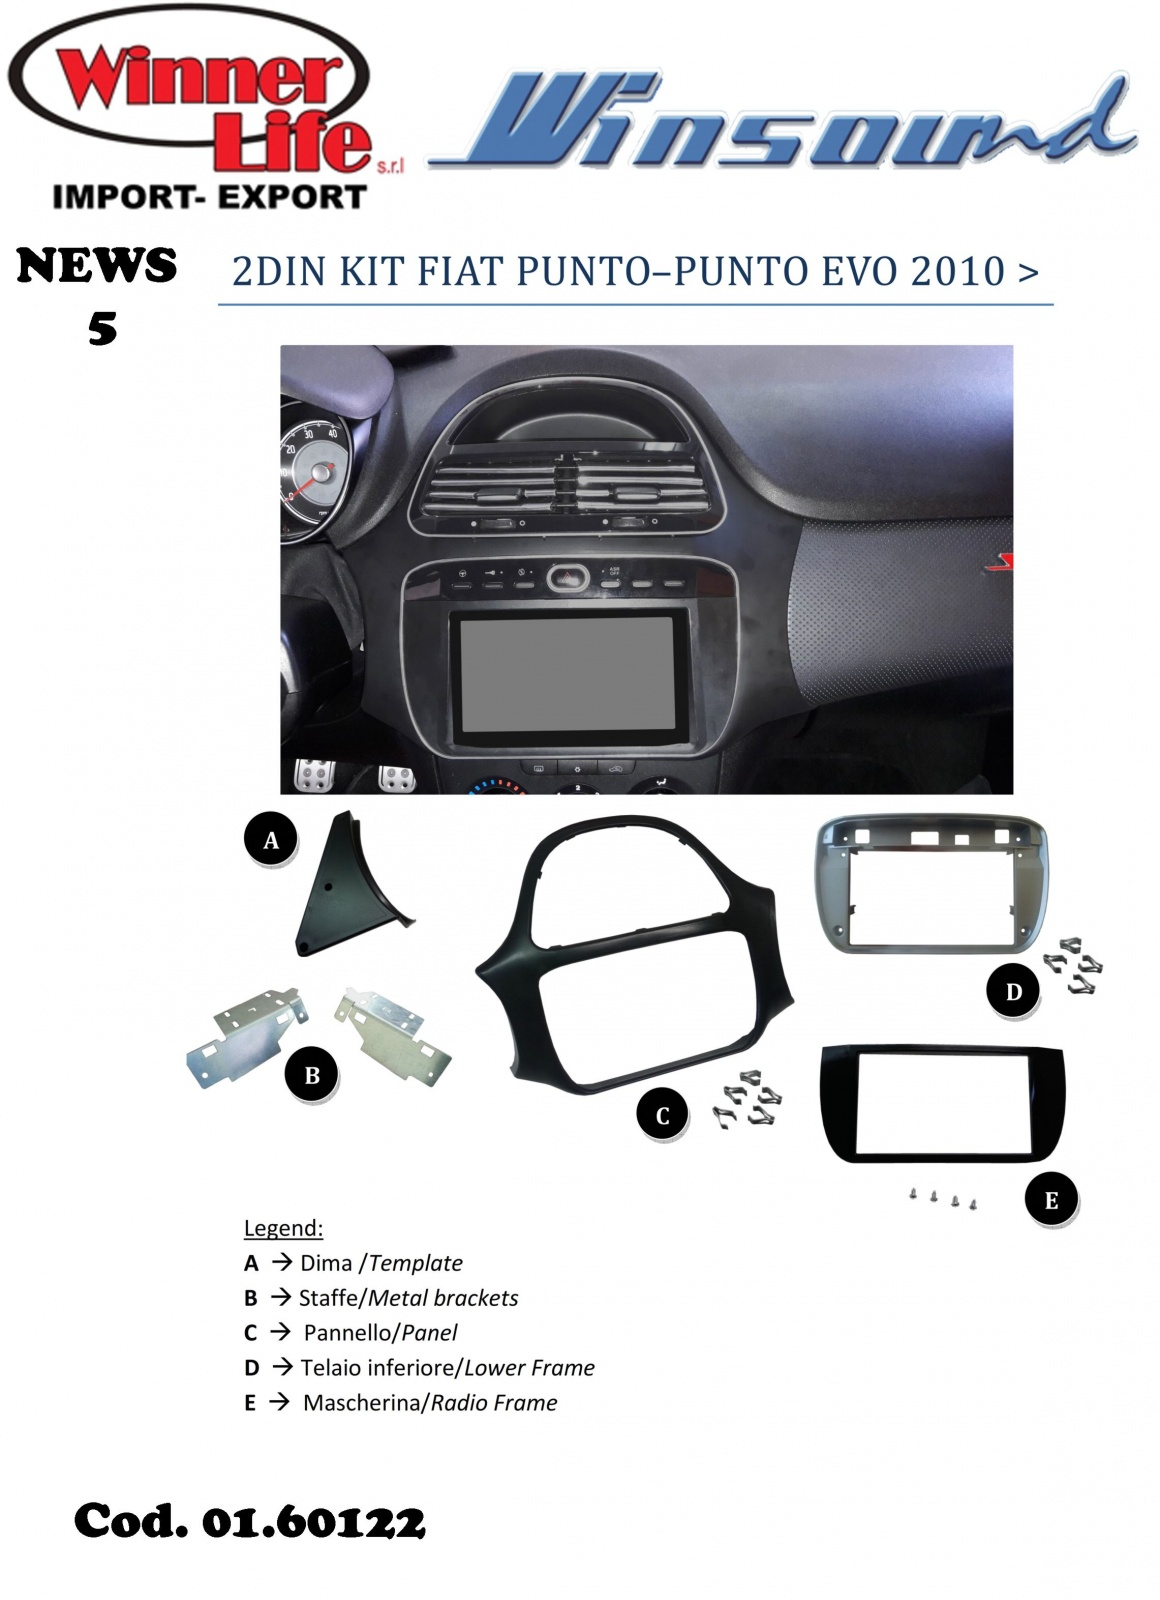 Ongekend KIT DOUBLE DIN FIAT PUNTO EVO KF-86